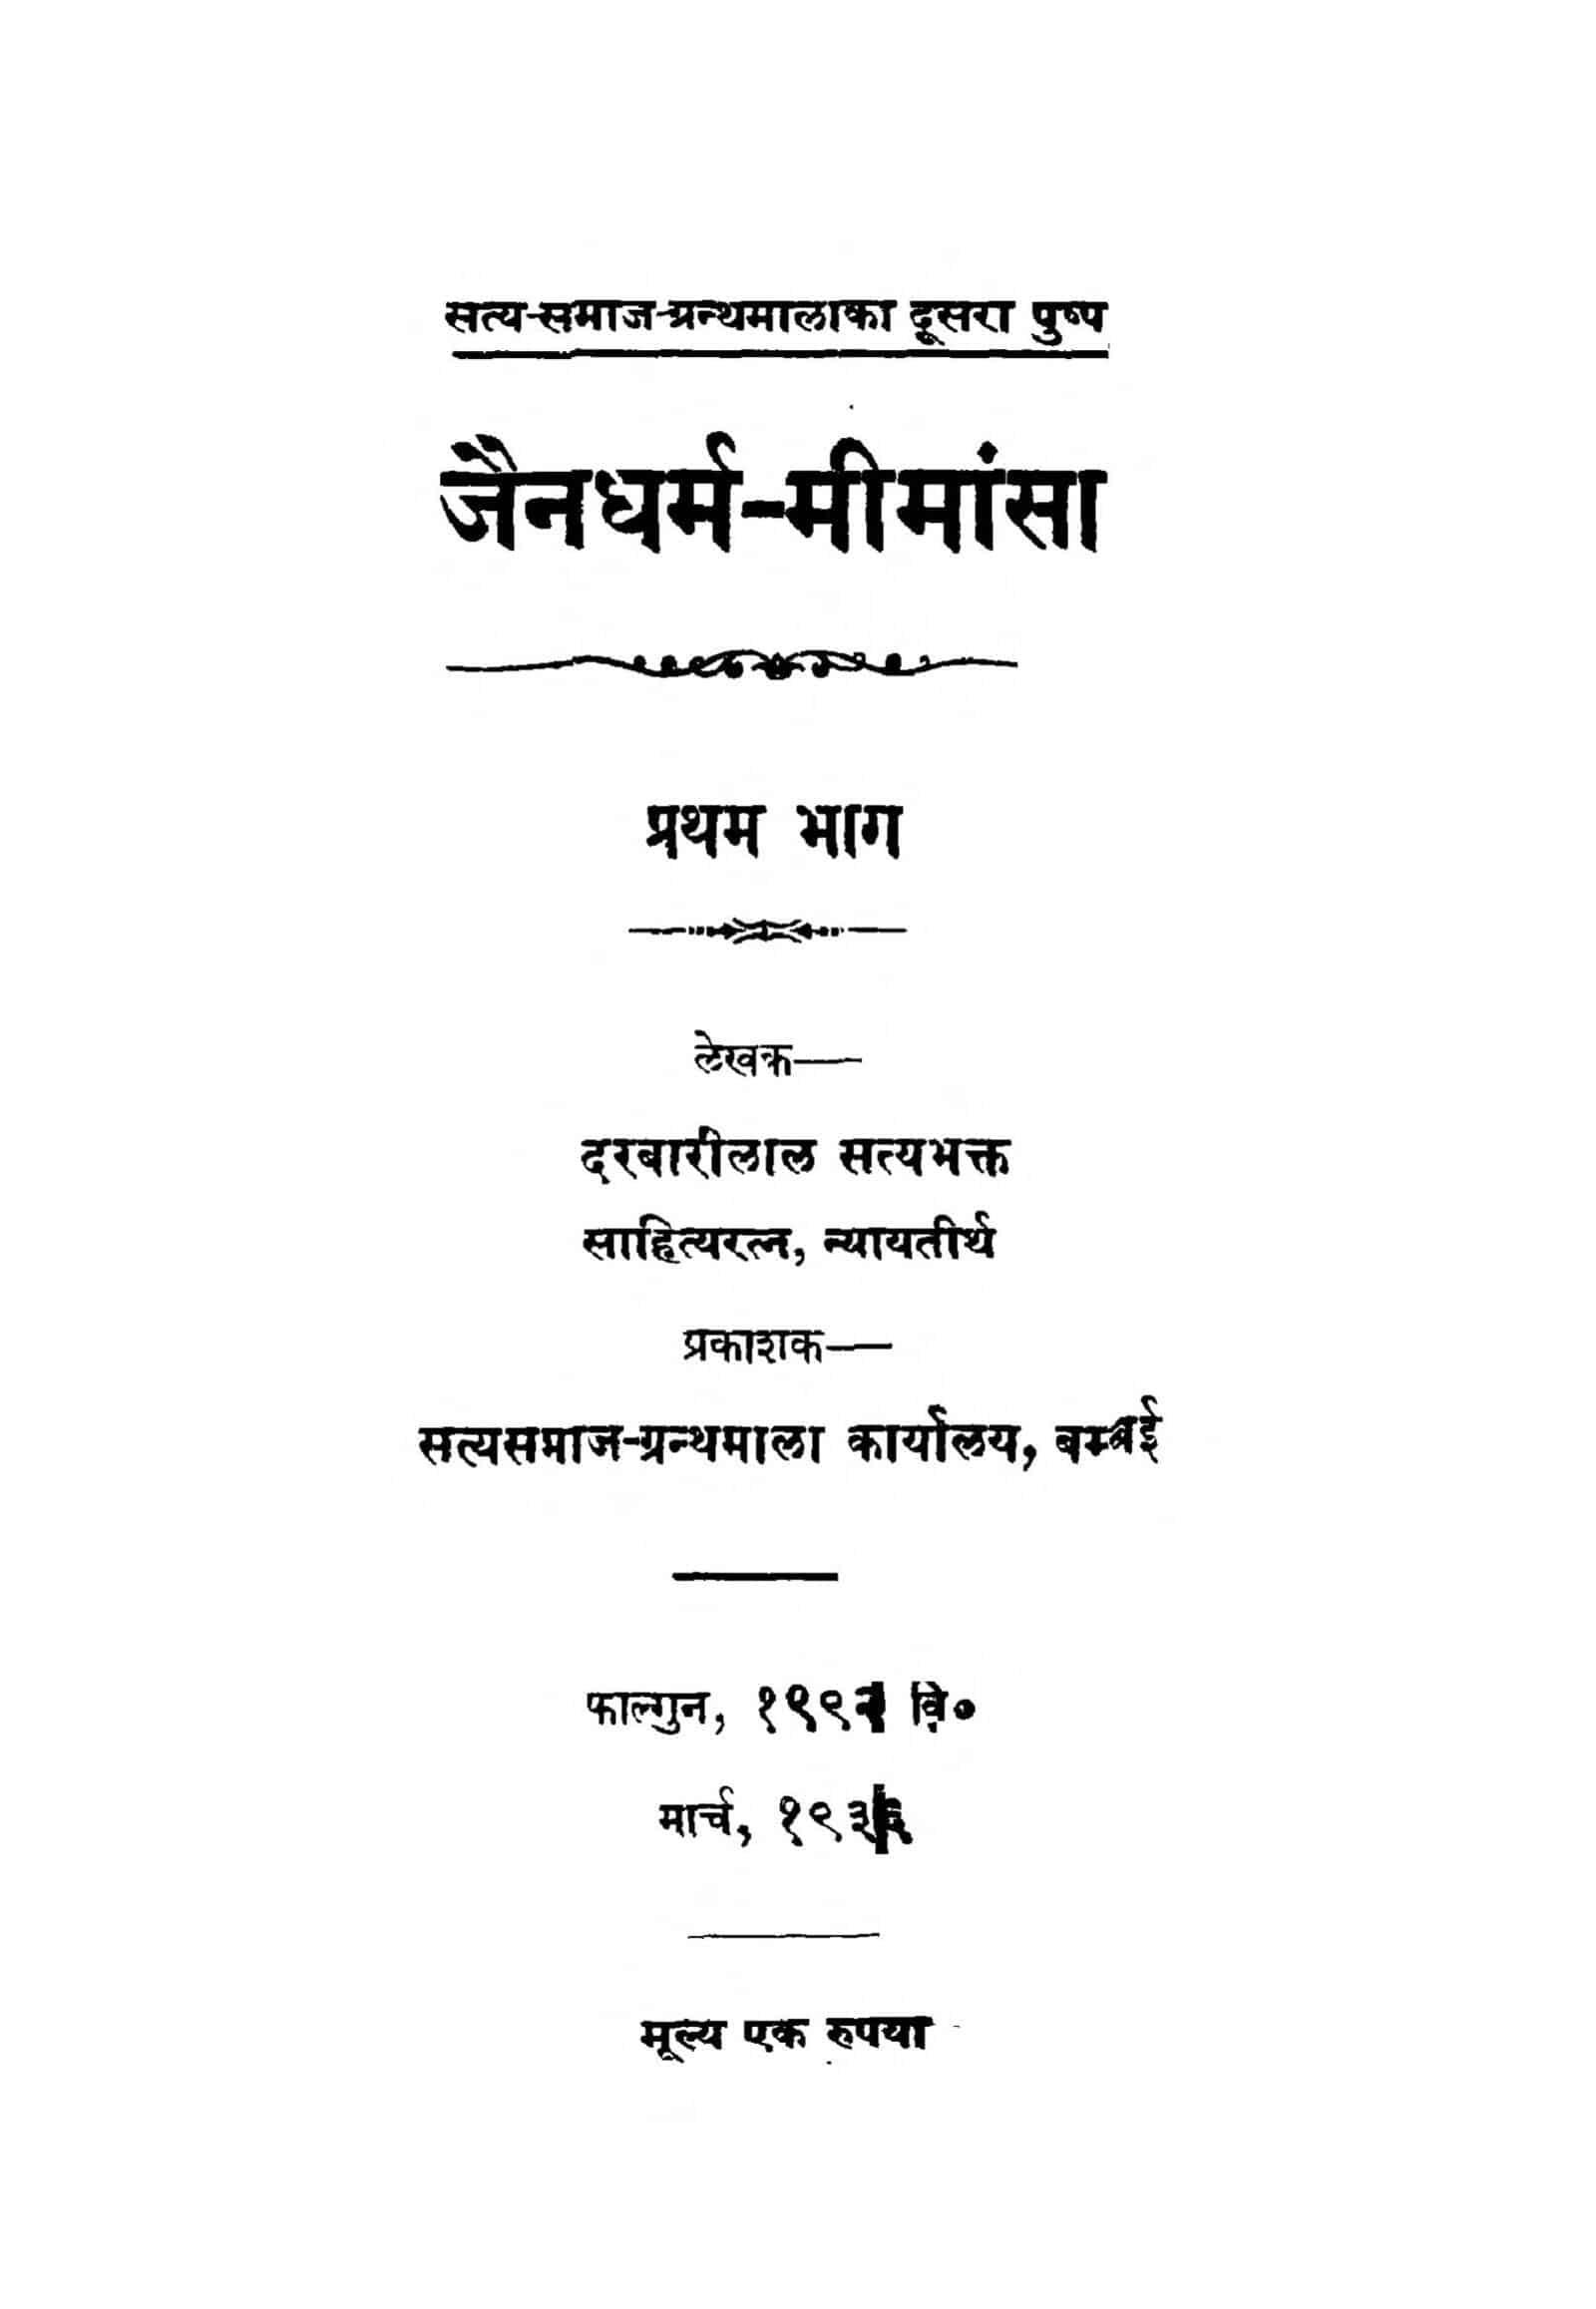 Book Image : जैनधर्म - मीमांसा भाग - 1 - Jaindharm - Mimansa Bhag - 1